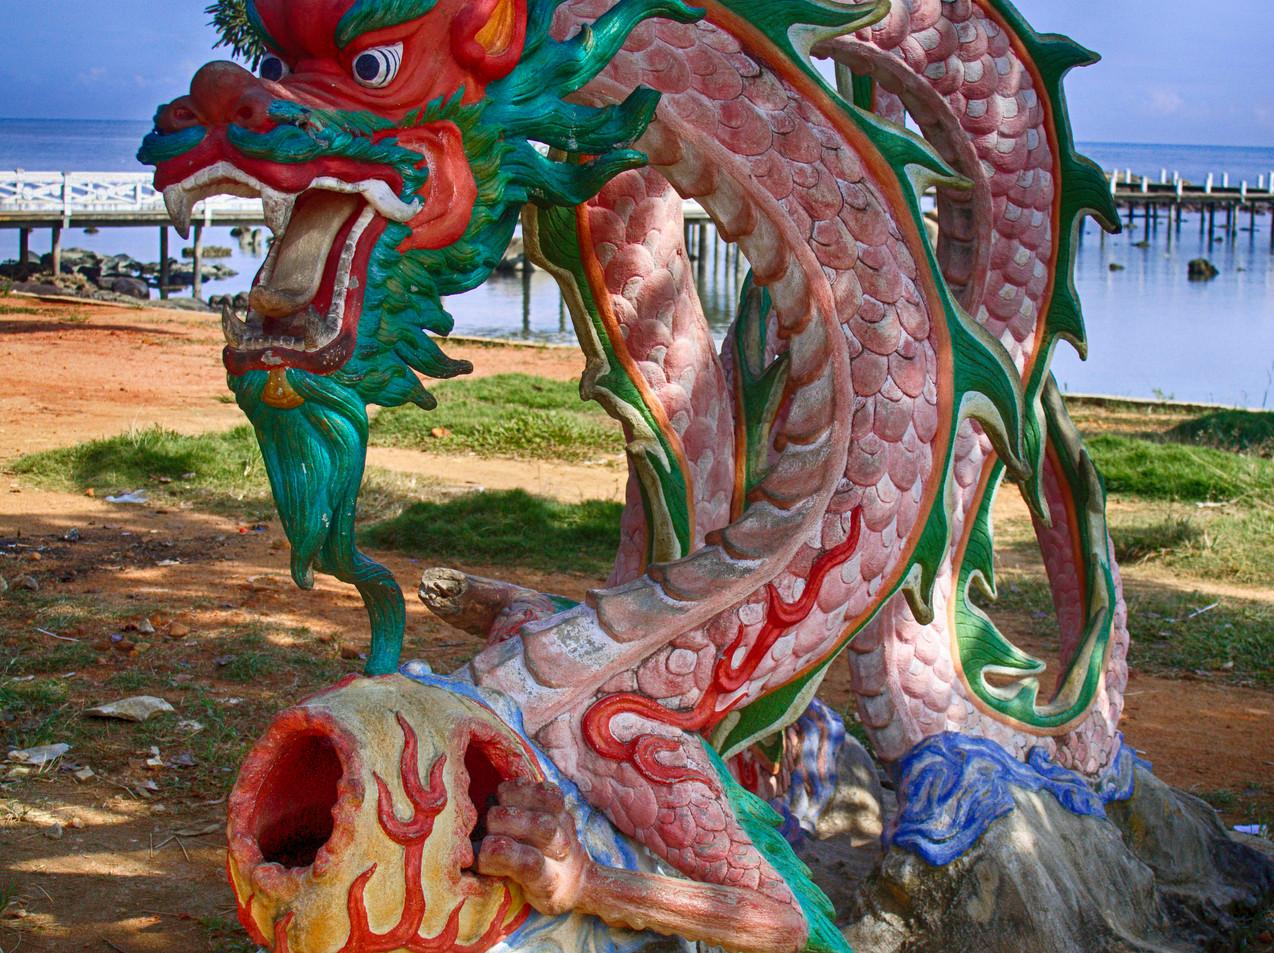 A Sculpture At Sinka Zoo